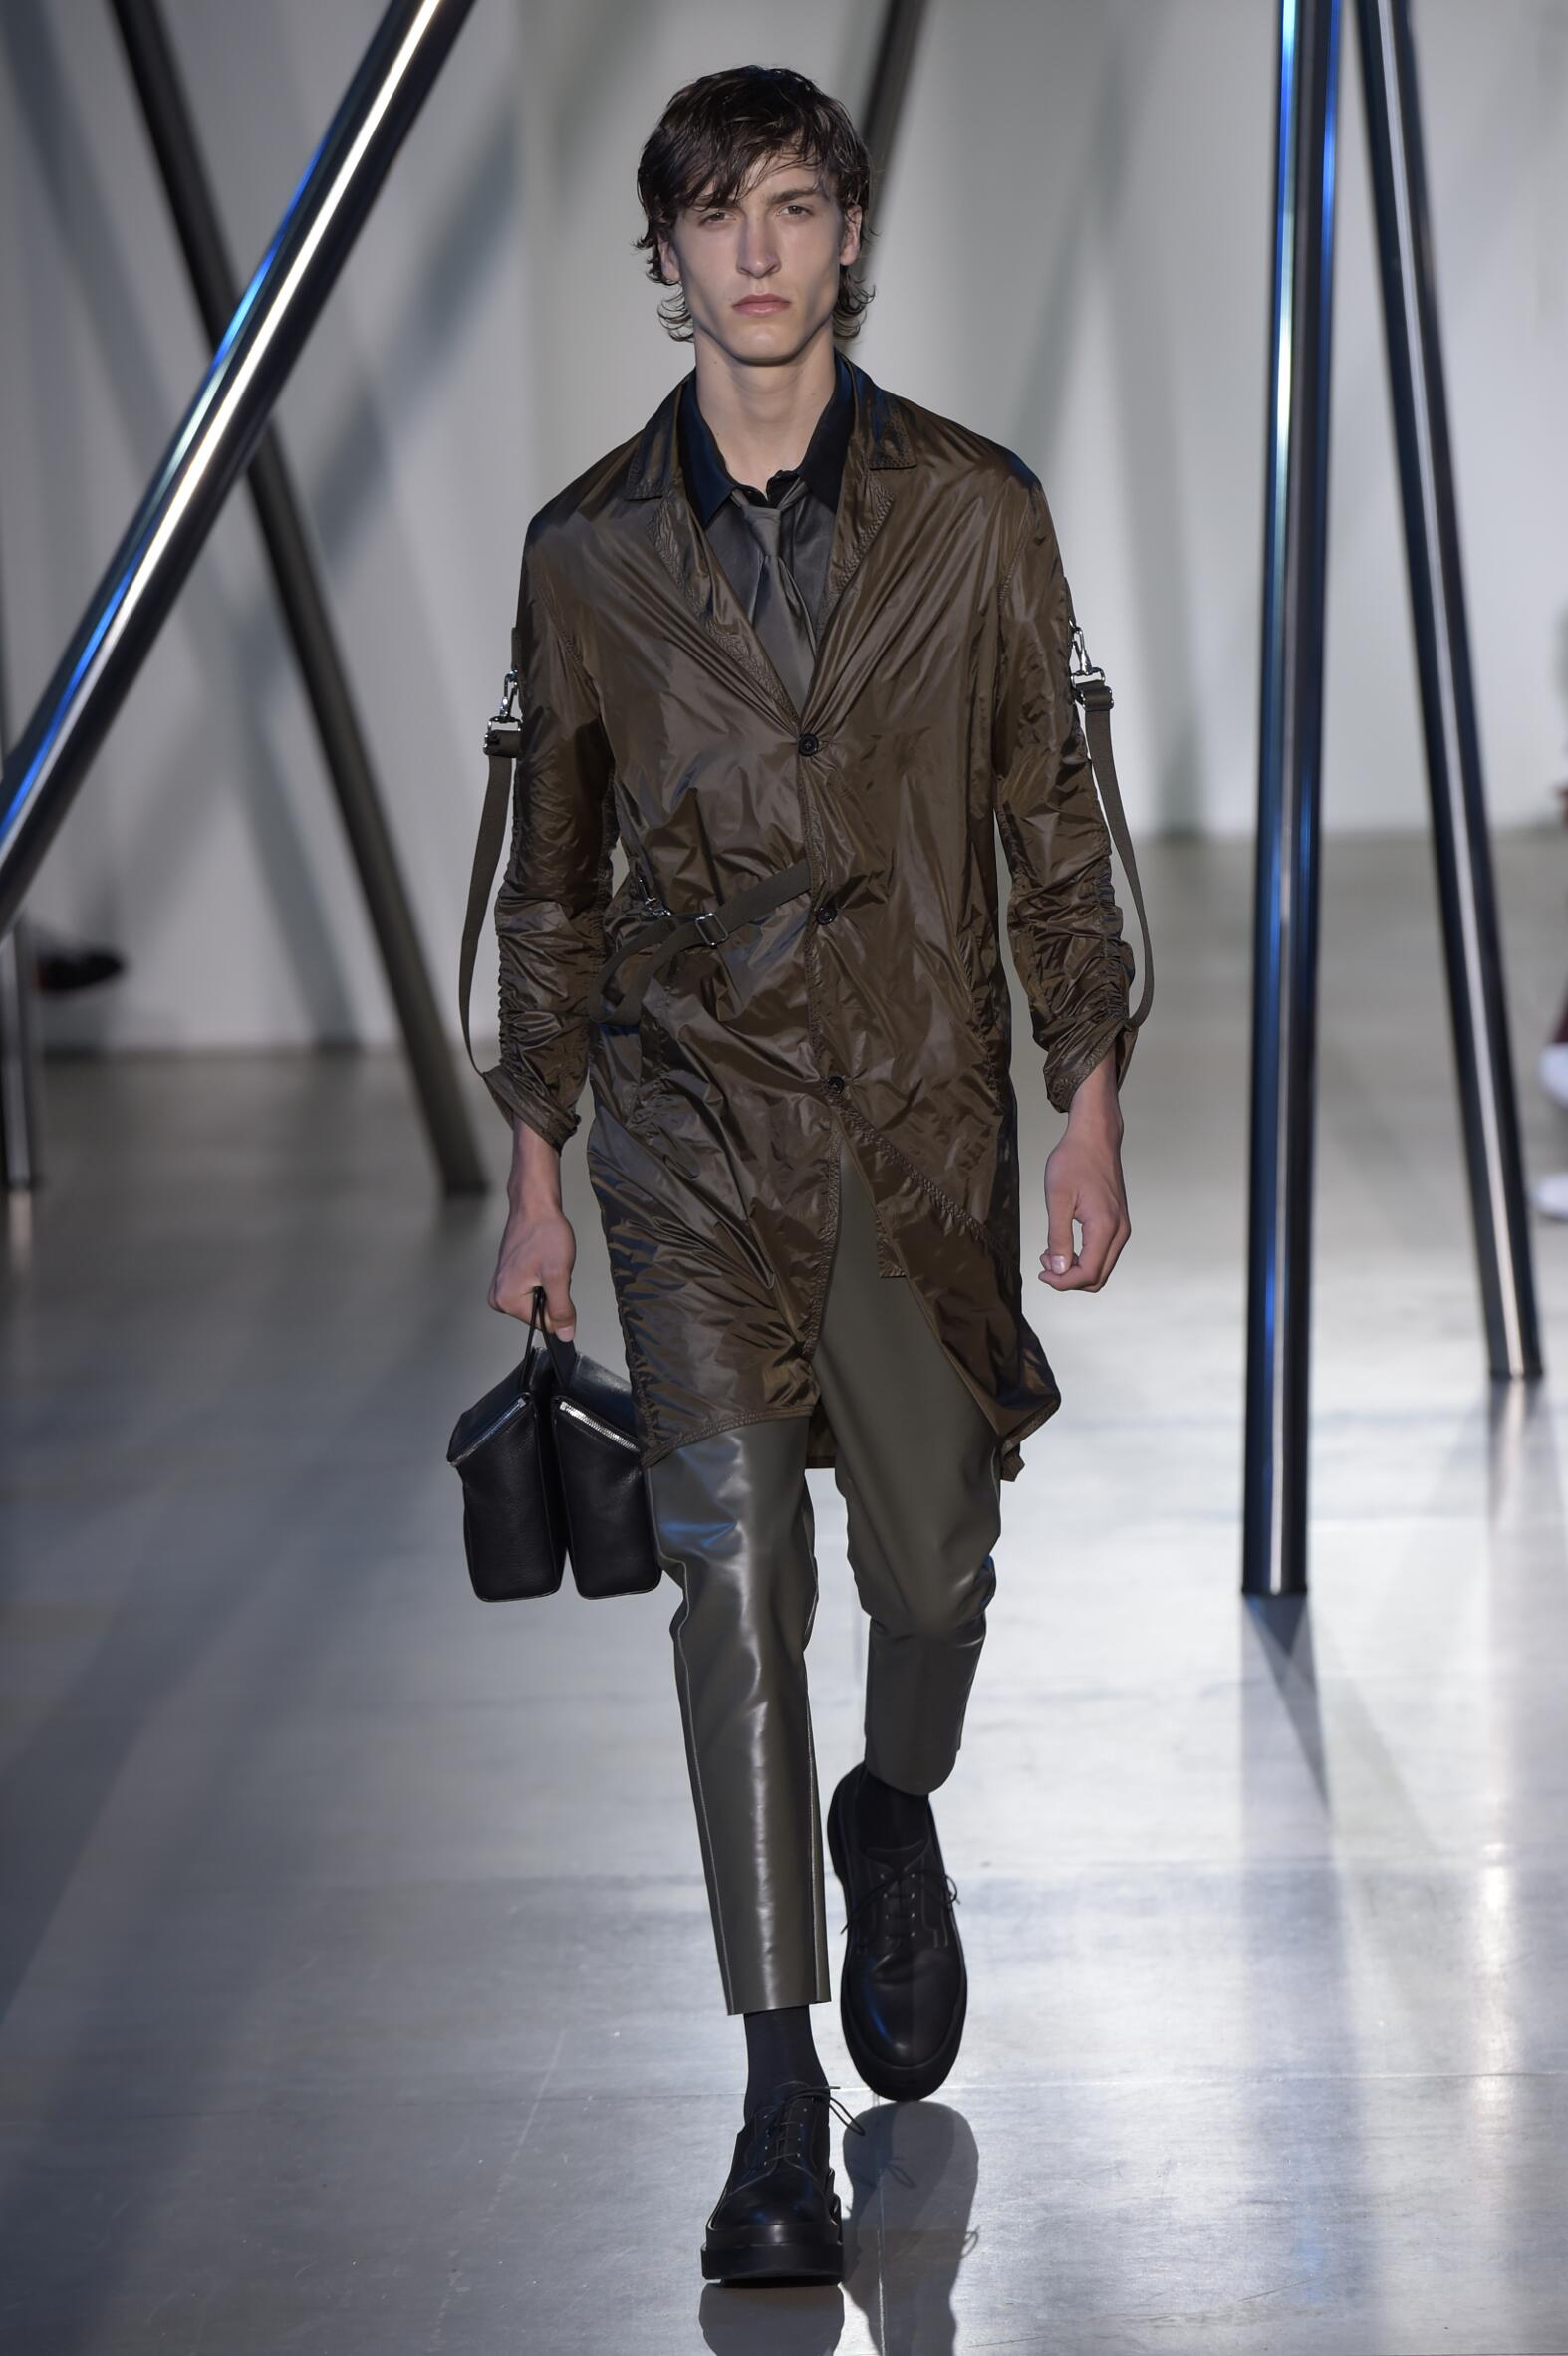 Summer Fashion Trends 2016 Jil Sander Collection